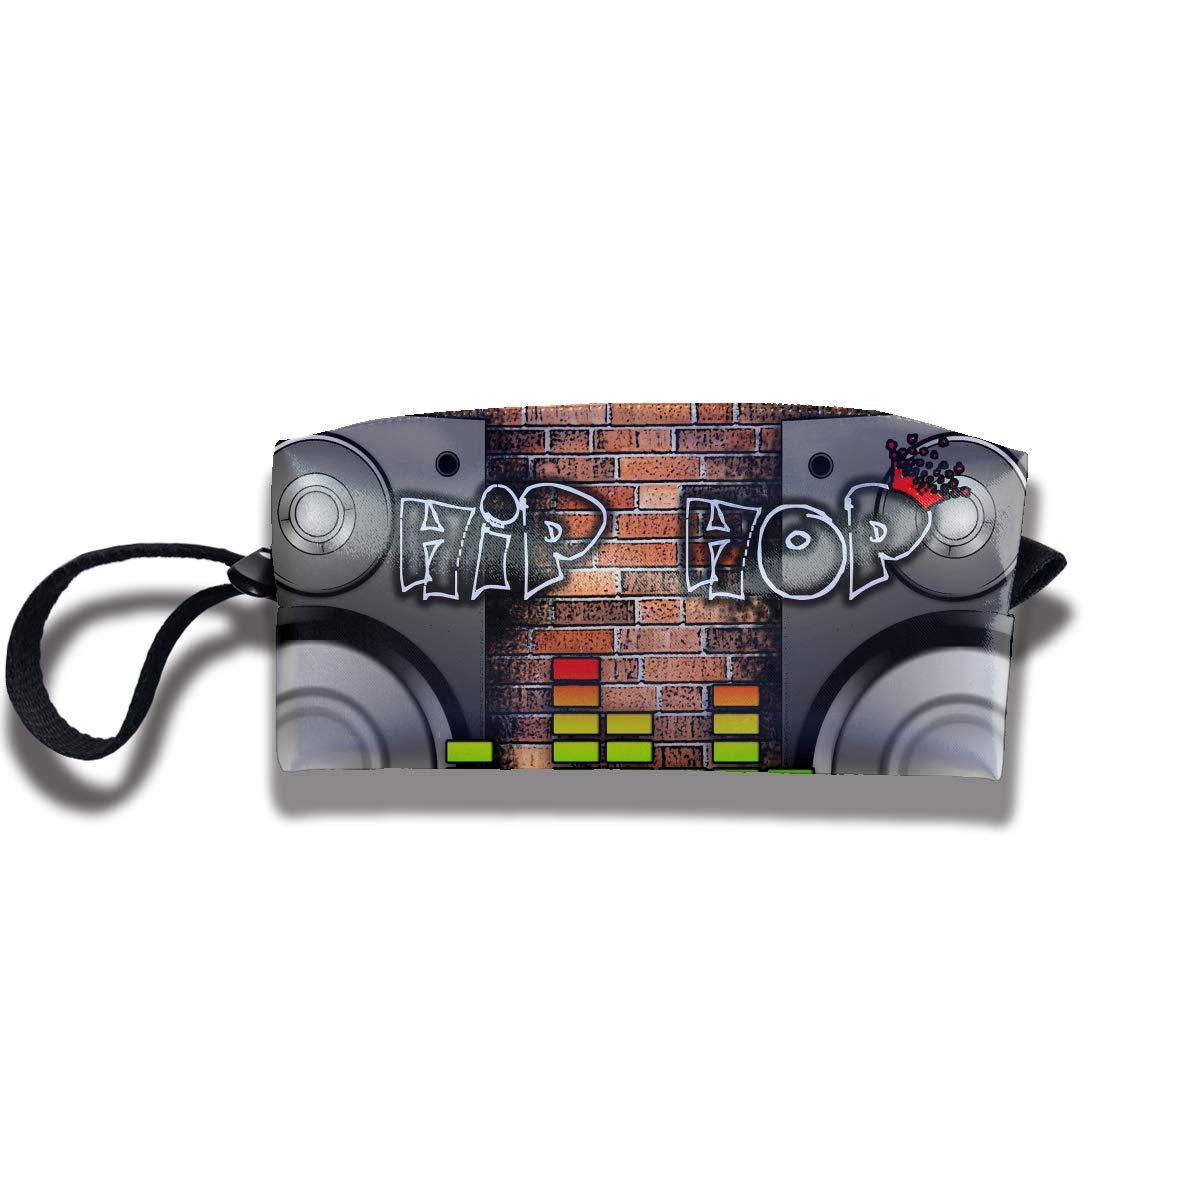 Cosmetic Bags With Zipper Makeup Bag Hip Hop Sound Middle Wallet Hangbag Wristlet Holder v5DGFJH.B